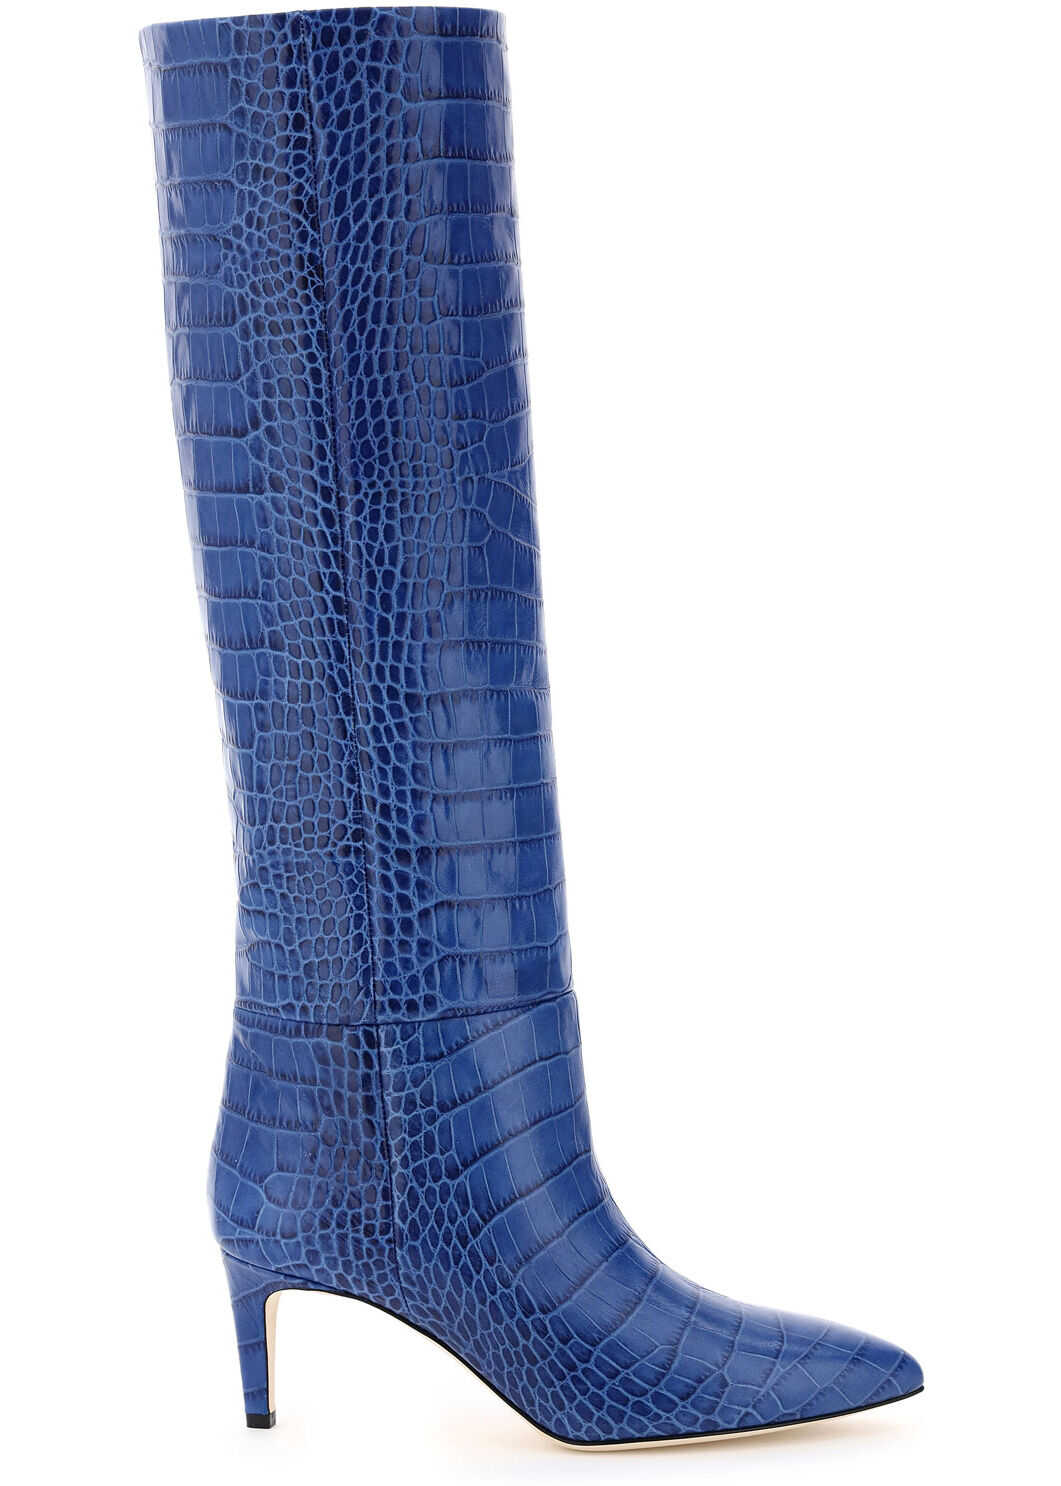 Paris Texas Crocodile-Embossed Boots PX503 XCAG2 BLUETTE imagine b-mall.ro